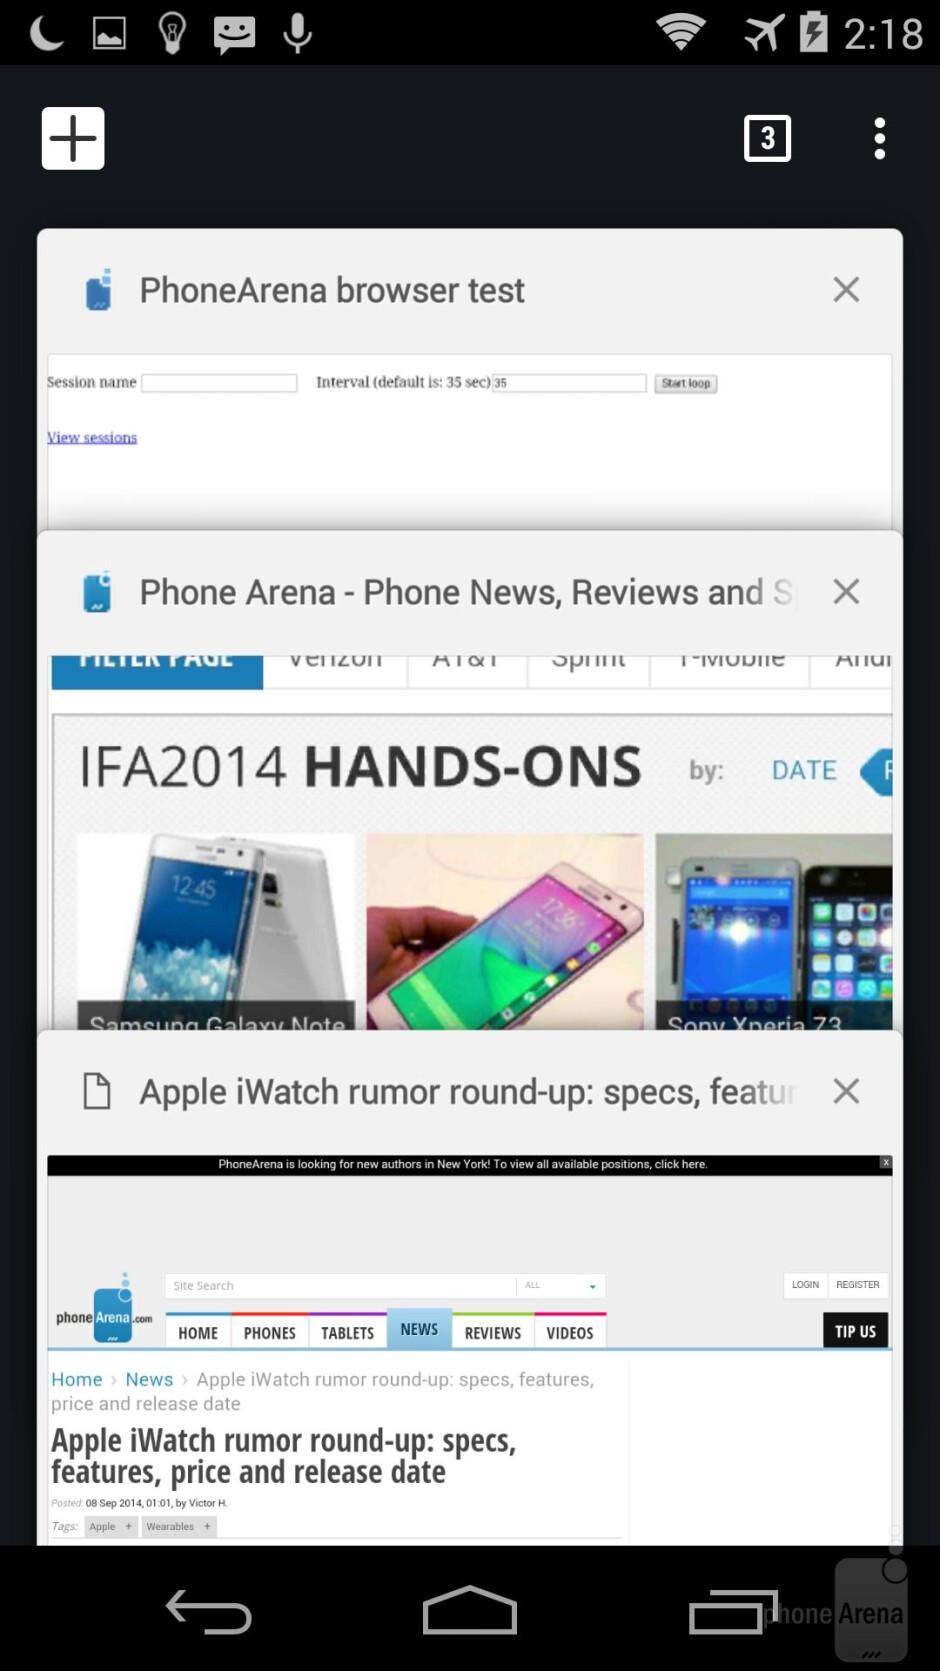 Web browsers - Apple iPhone 6 vs Motorola Moto X 2014